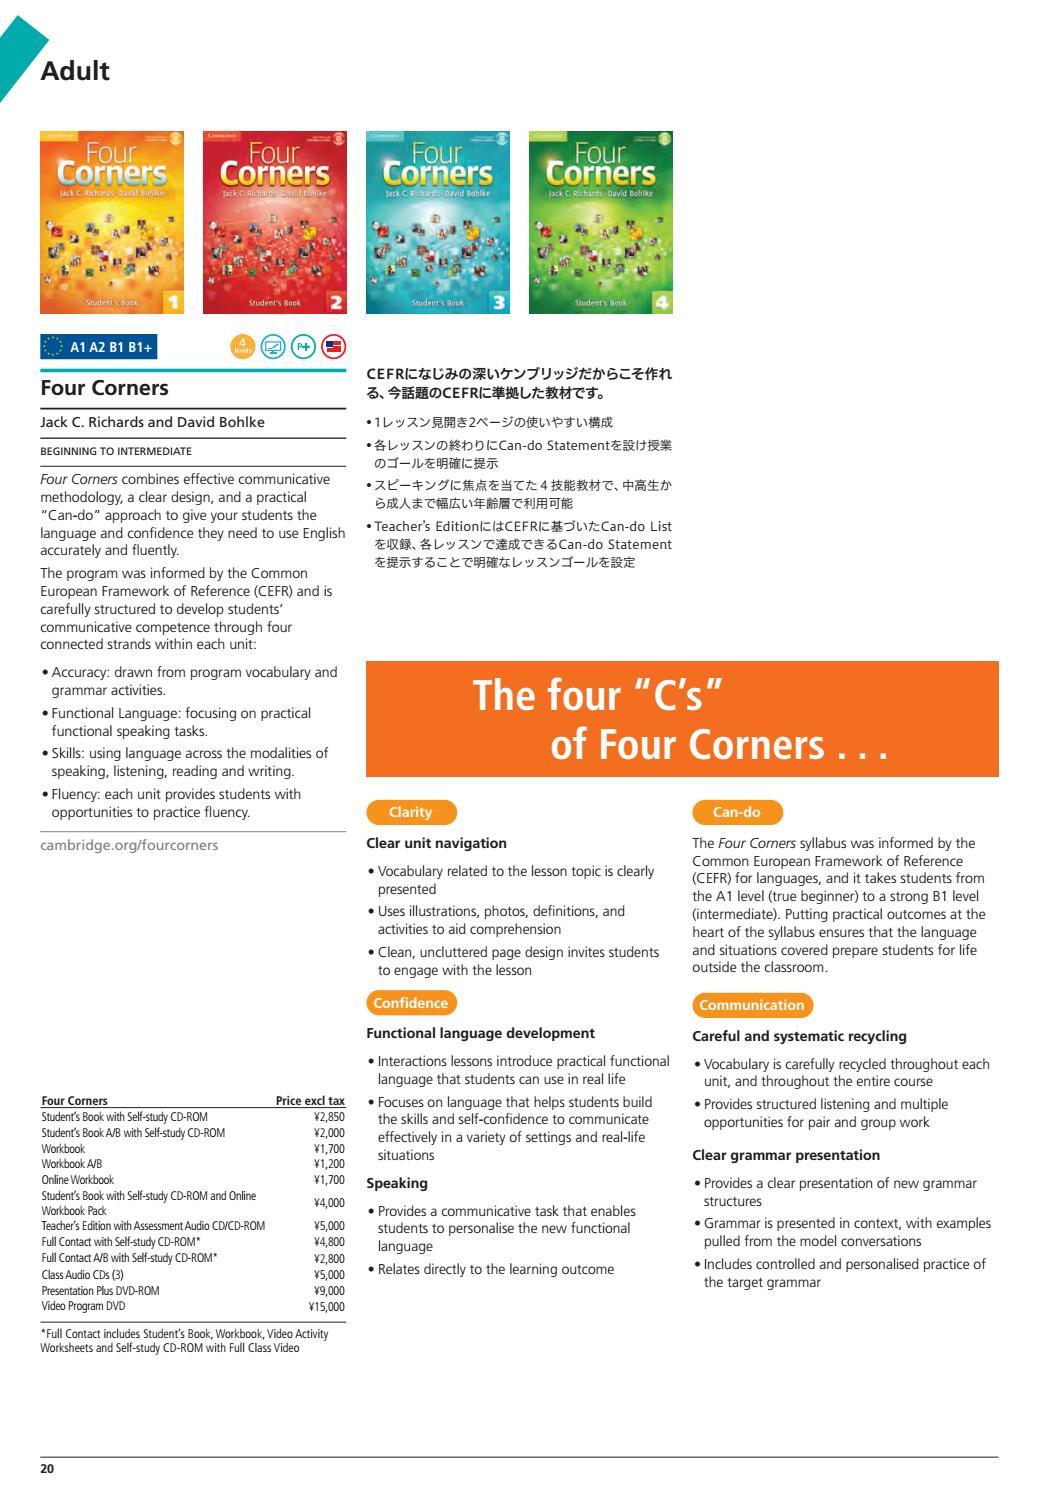 2017 ELT Cambridge University Press catalogue - Japan by